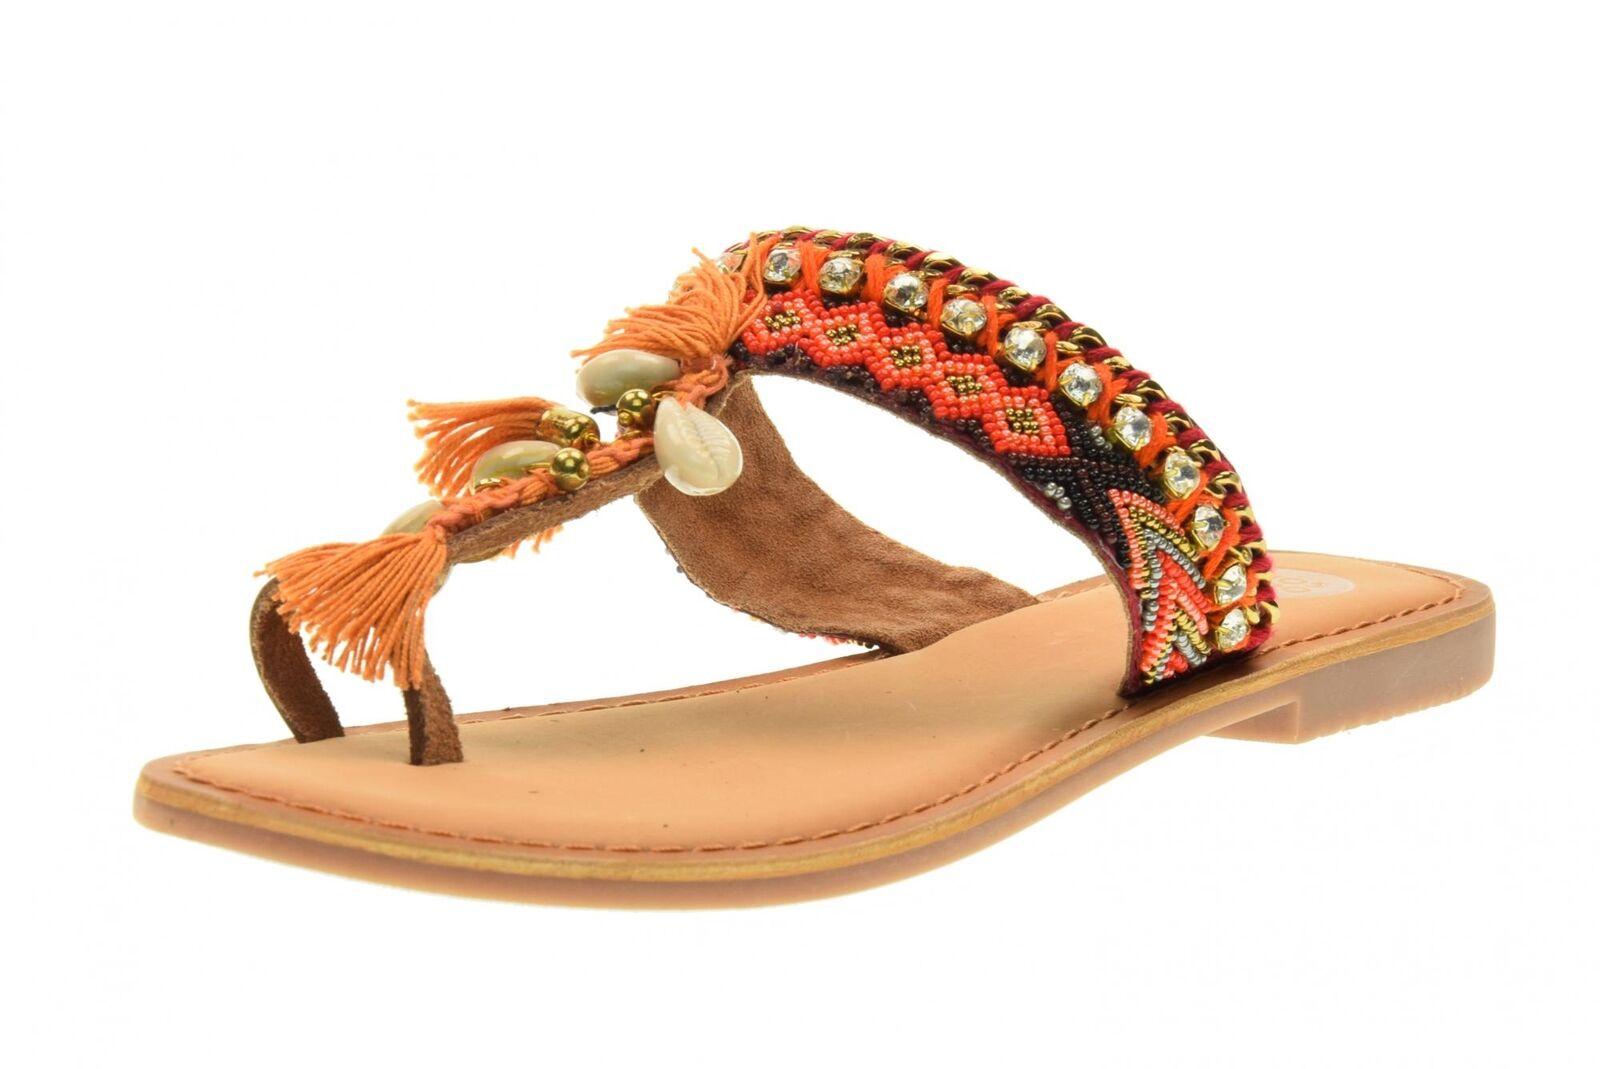 Gioseppo P17f P17f P17f flip shoes women flops 40495-18 AVENTINA 6b184b